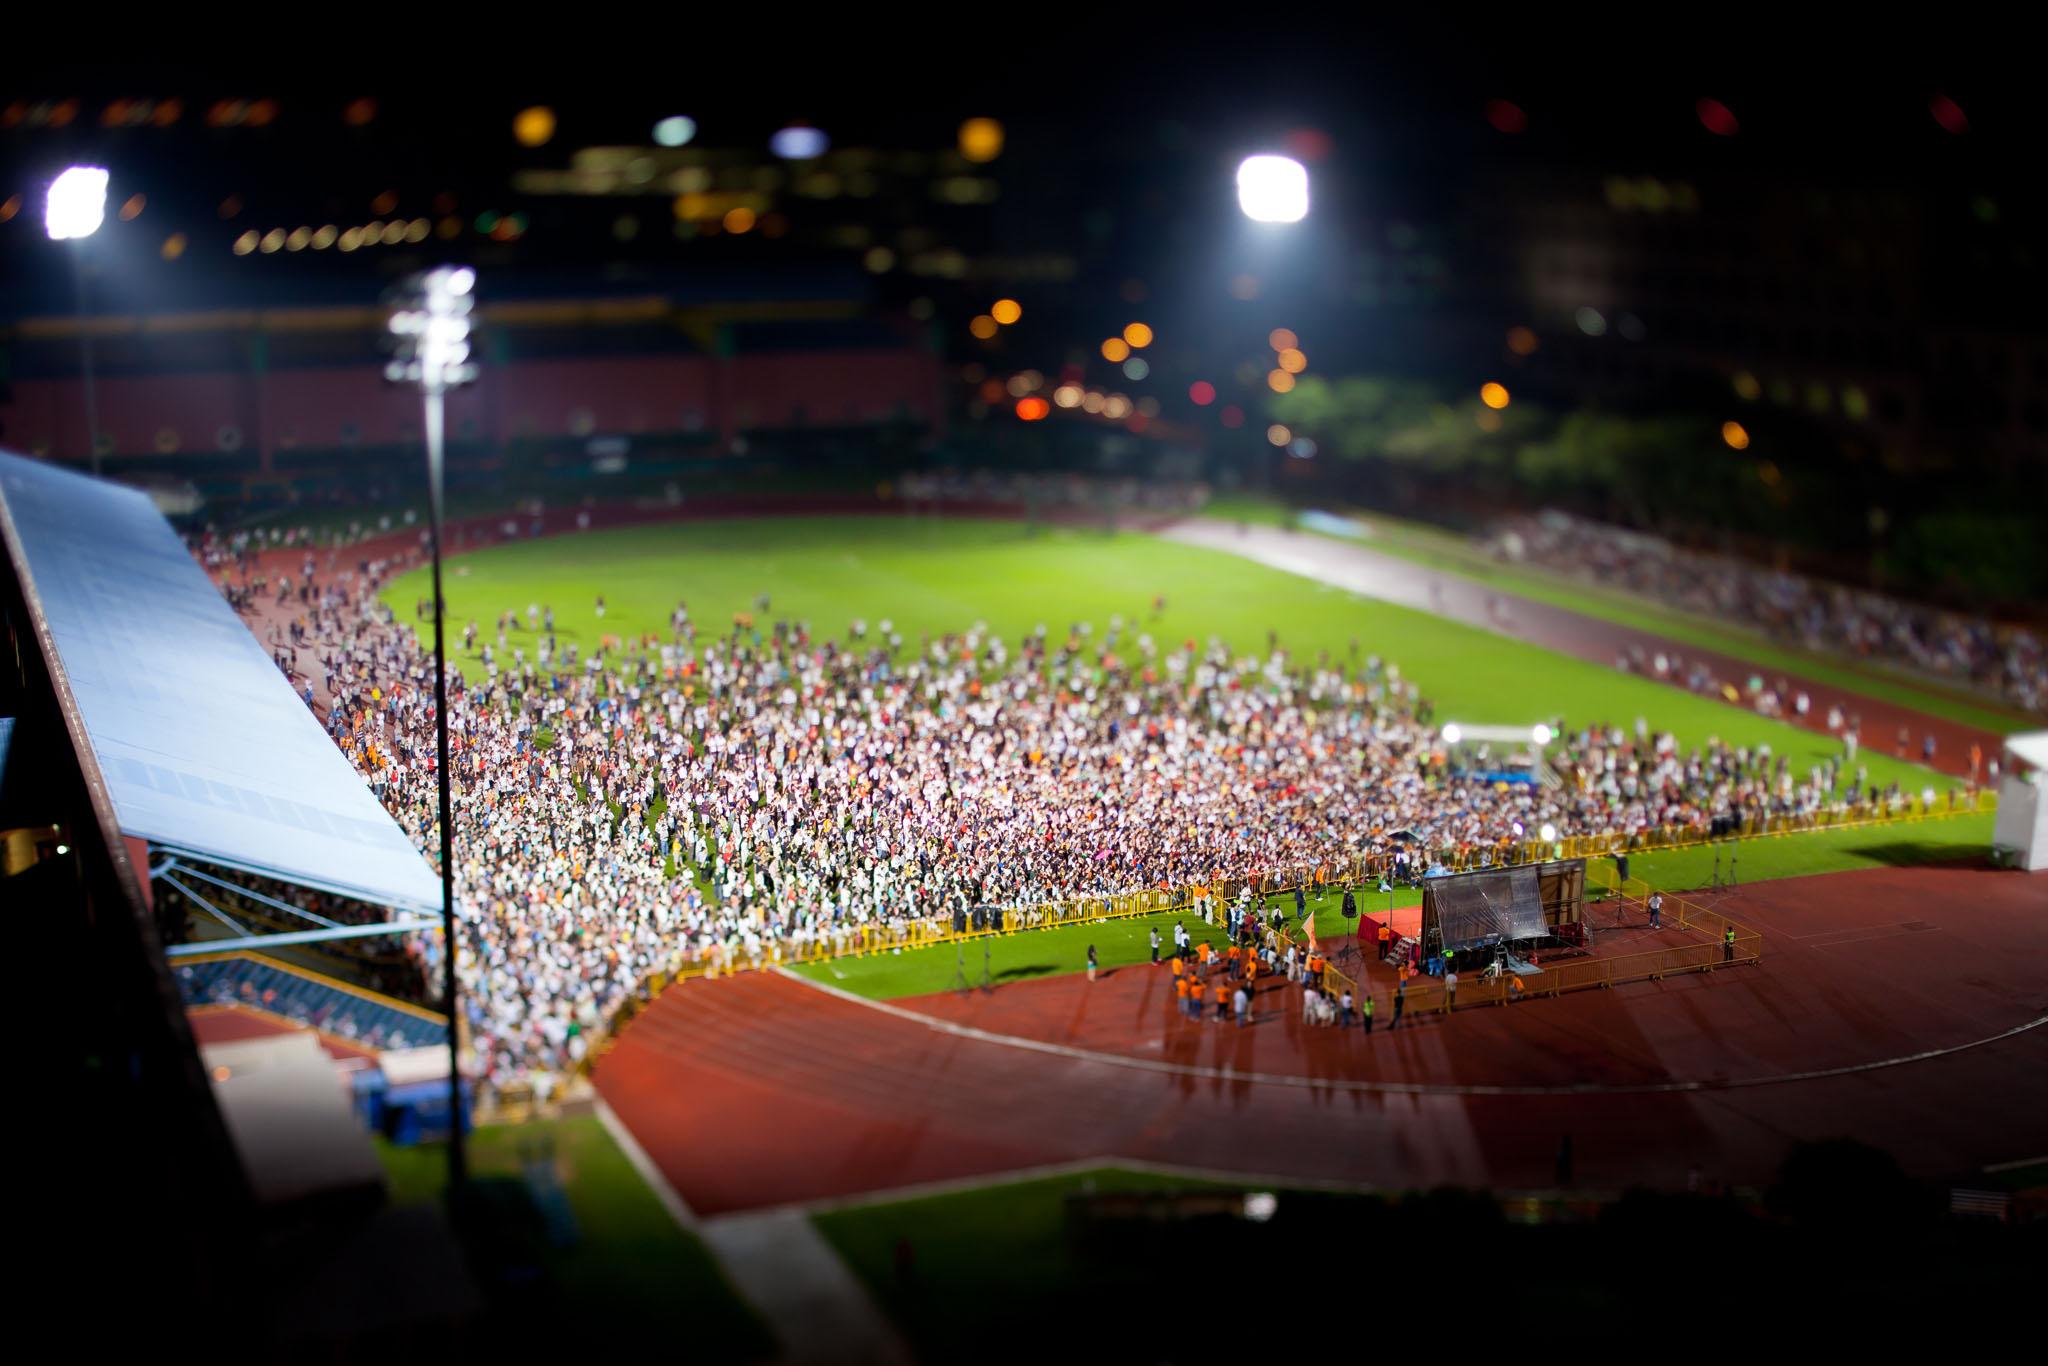 singapore-commercial-photographer-editorial-documentary-tiltshift-singaplural-zakaria-zainal-12.jpg